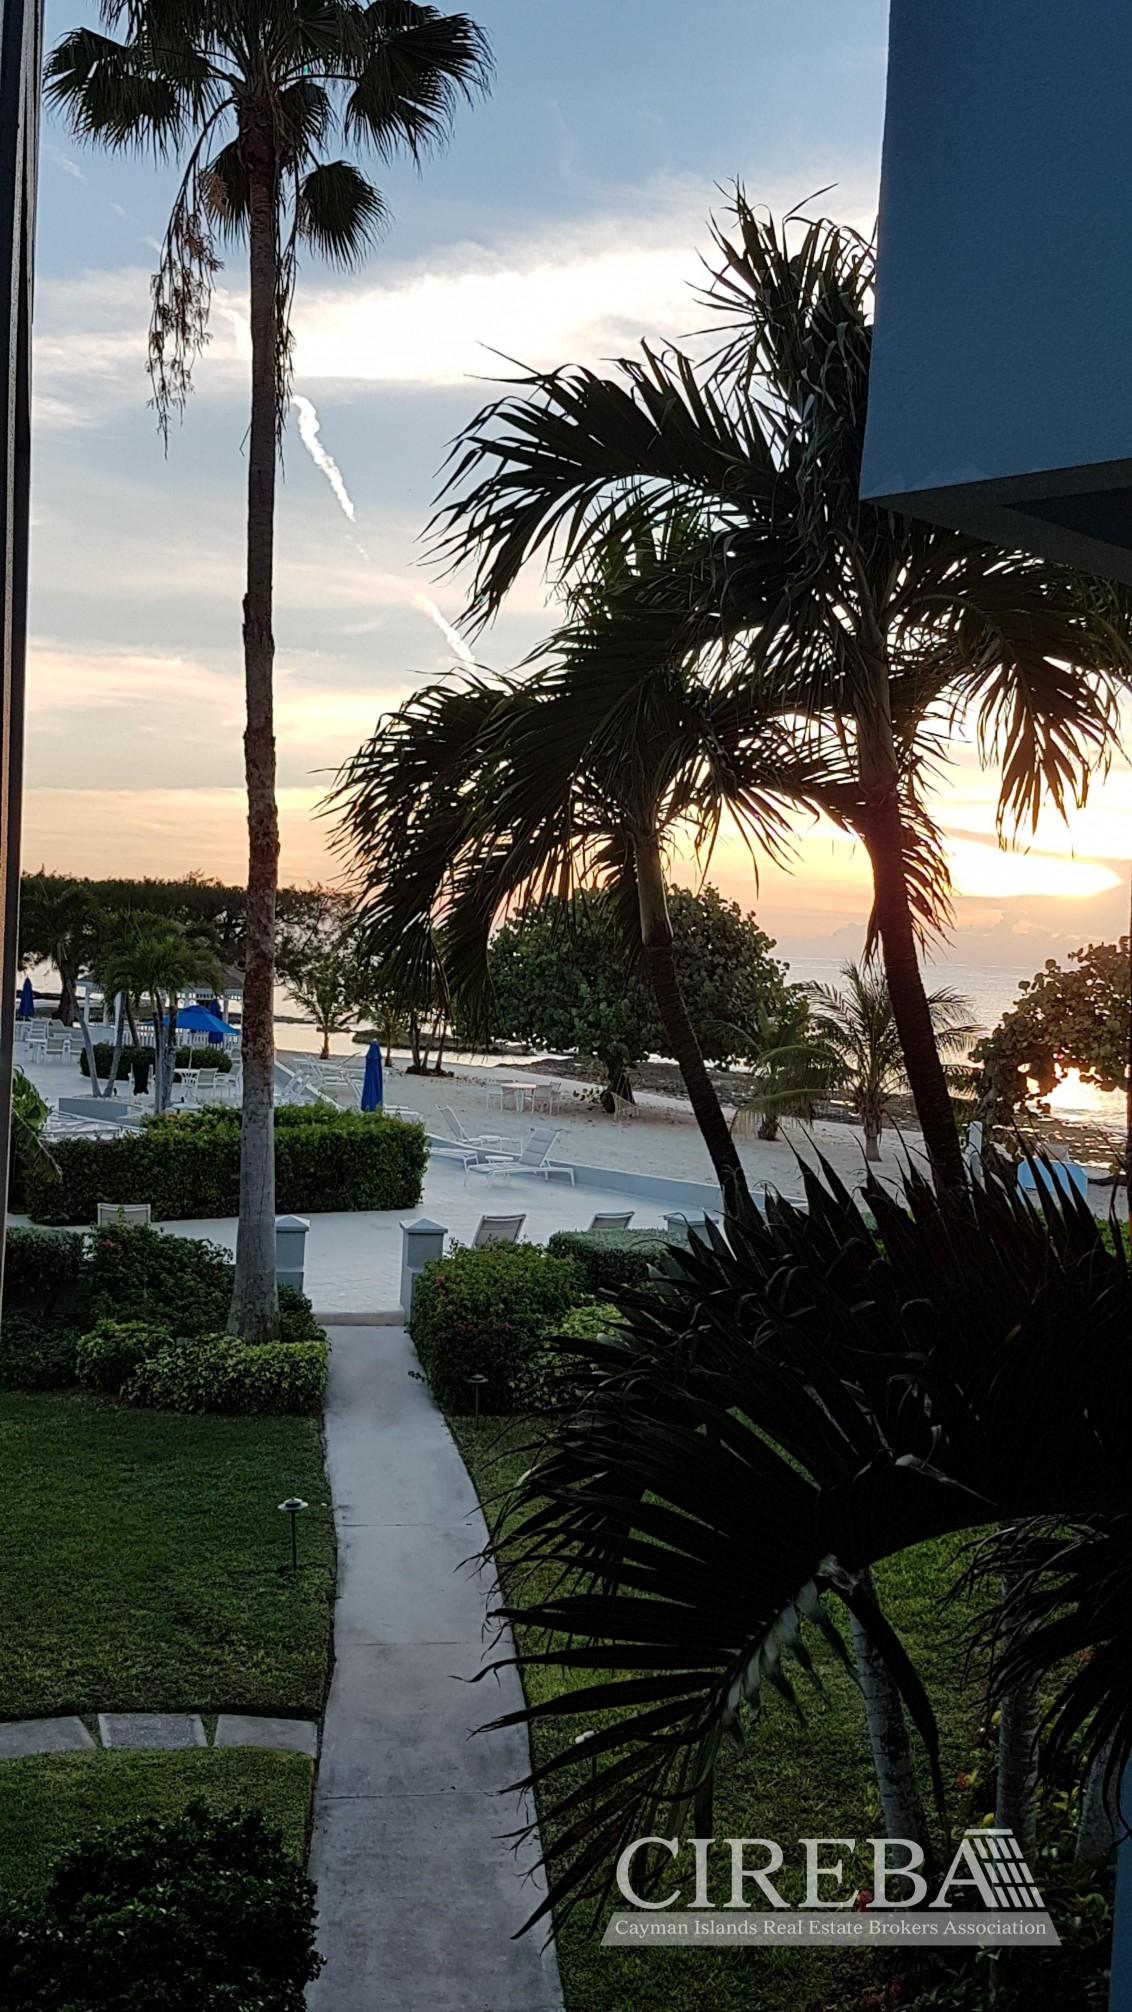 The Grand View, Seven Mile Beach - Image 3